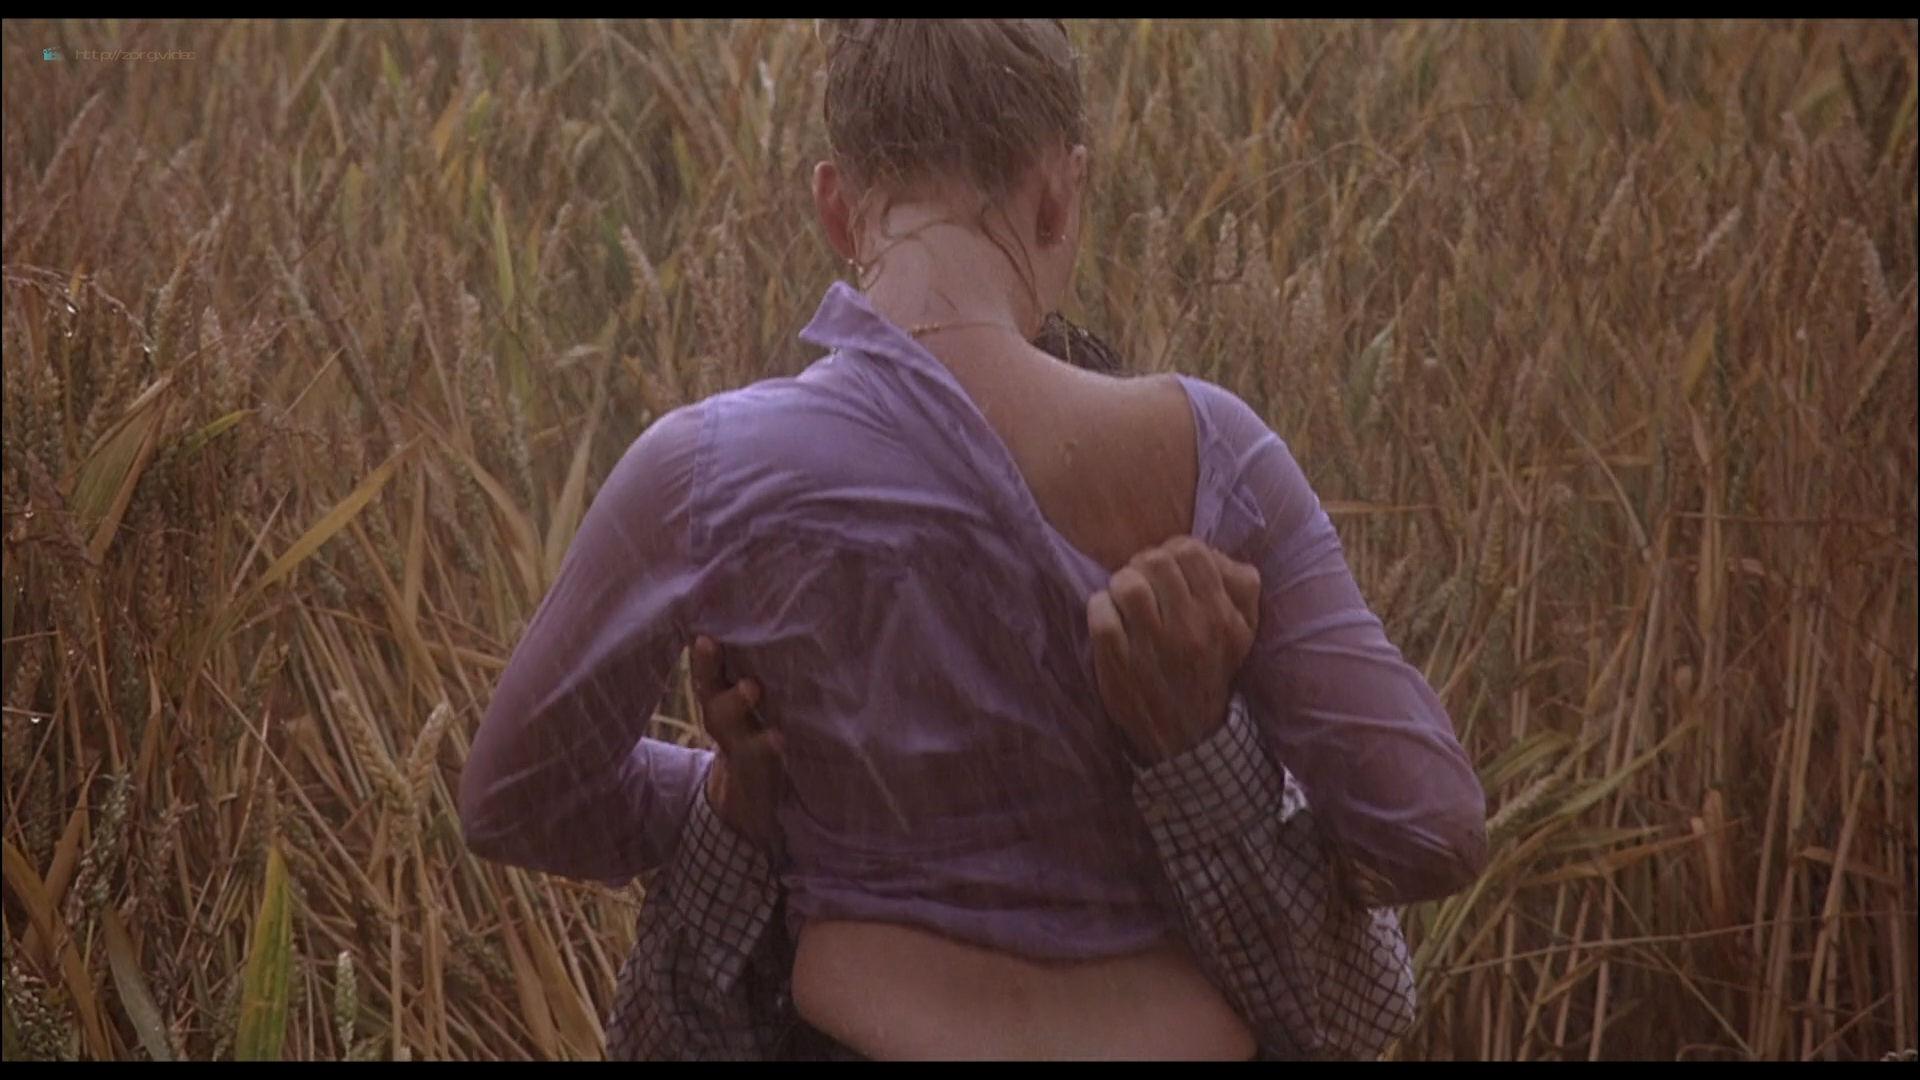 Scarlett Johansson see through and sex - Match Point (2005) HD 1080p BluRay (10)